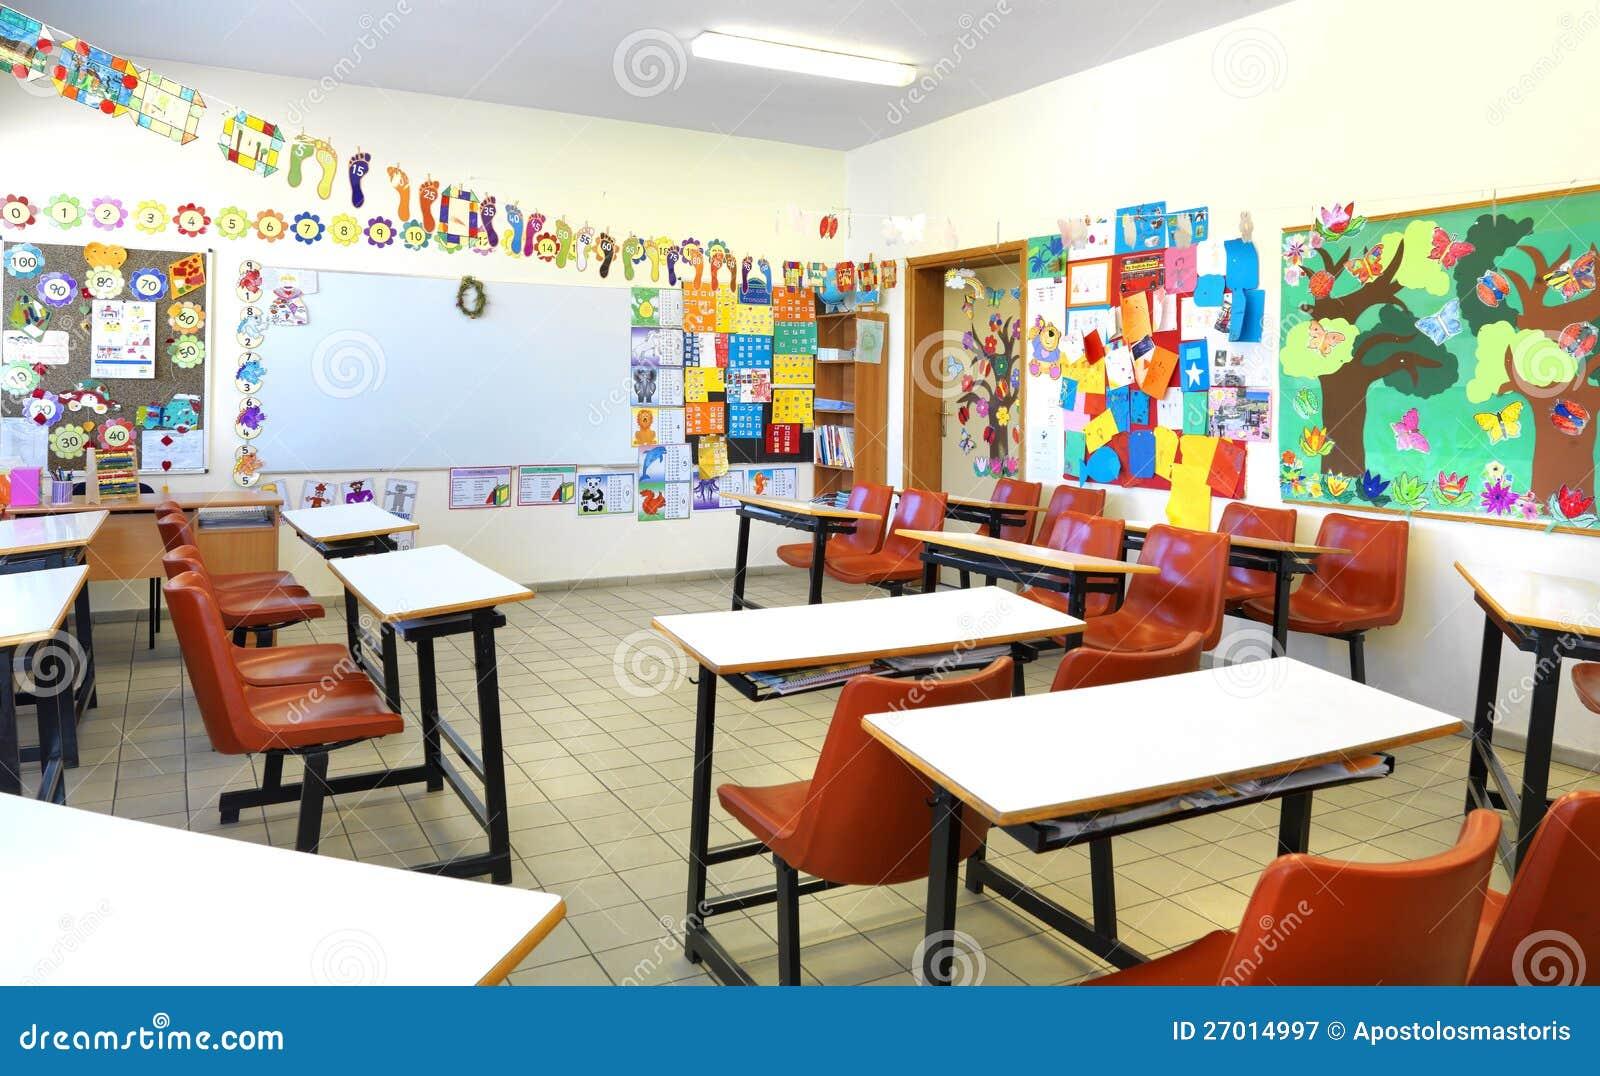 salle de classe d 39 cole primaire image stock image du kindergarten lumi re 27014997. Black Bedroom Furniture Sets. Home Design Ideas